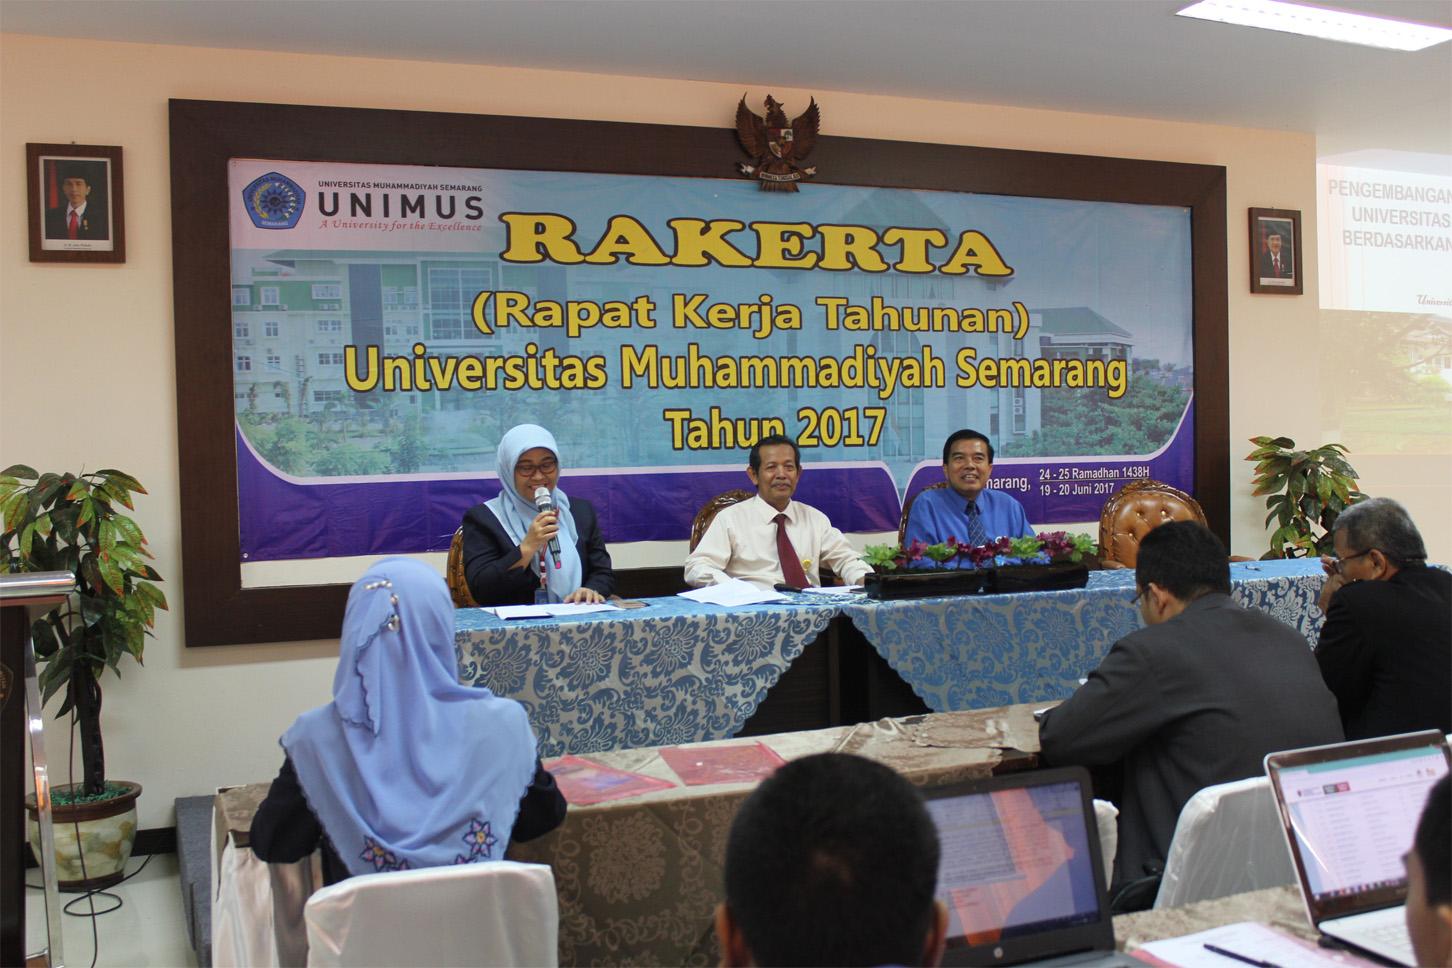 Dari Kiri: Wakil Rektor I Unimus dalam sesi diskusi tentang Pengembangan akademik menuju World Class University